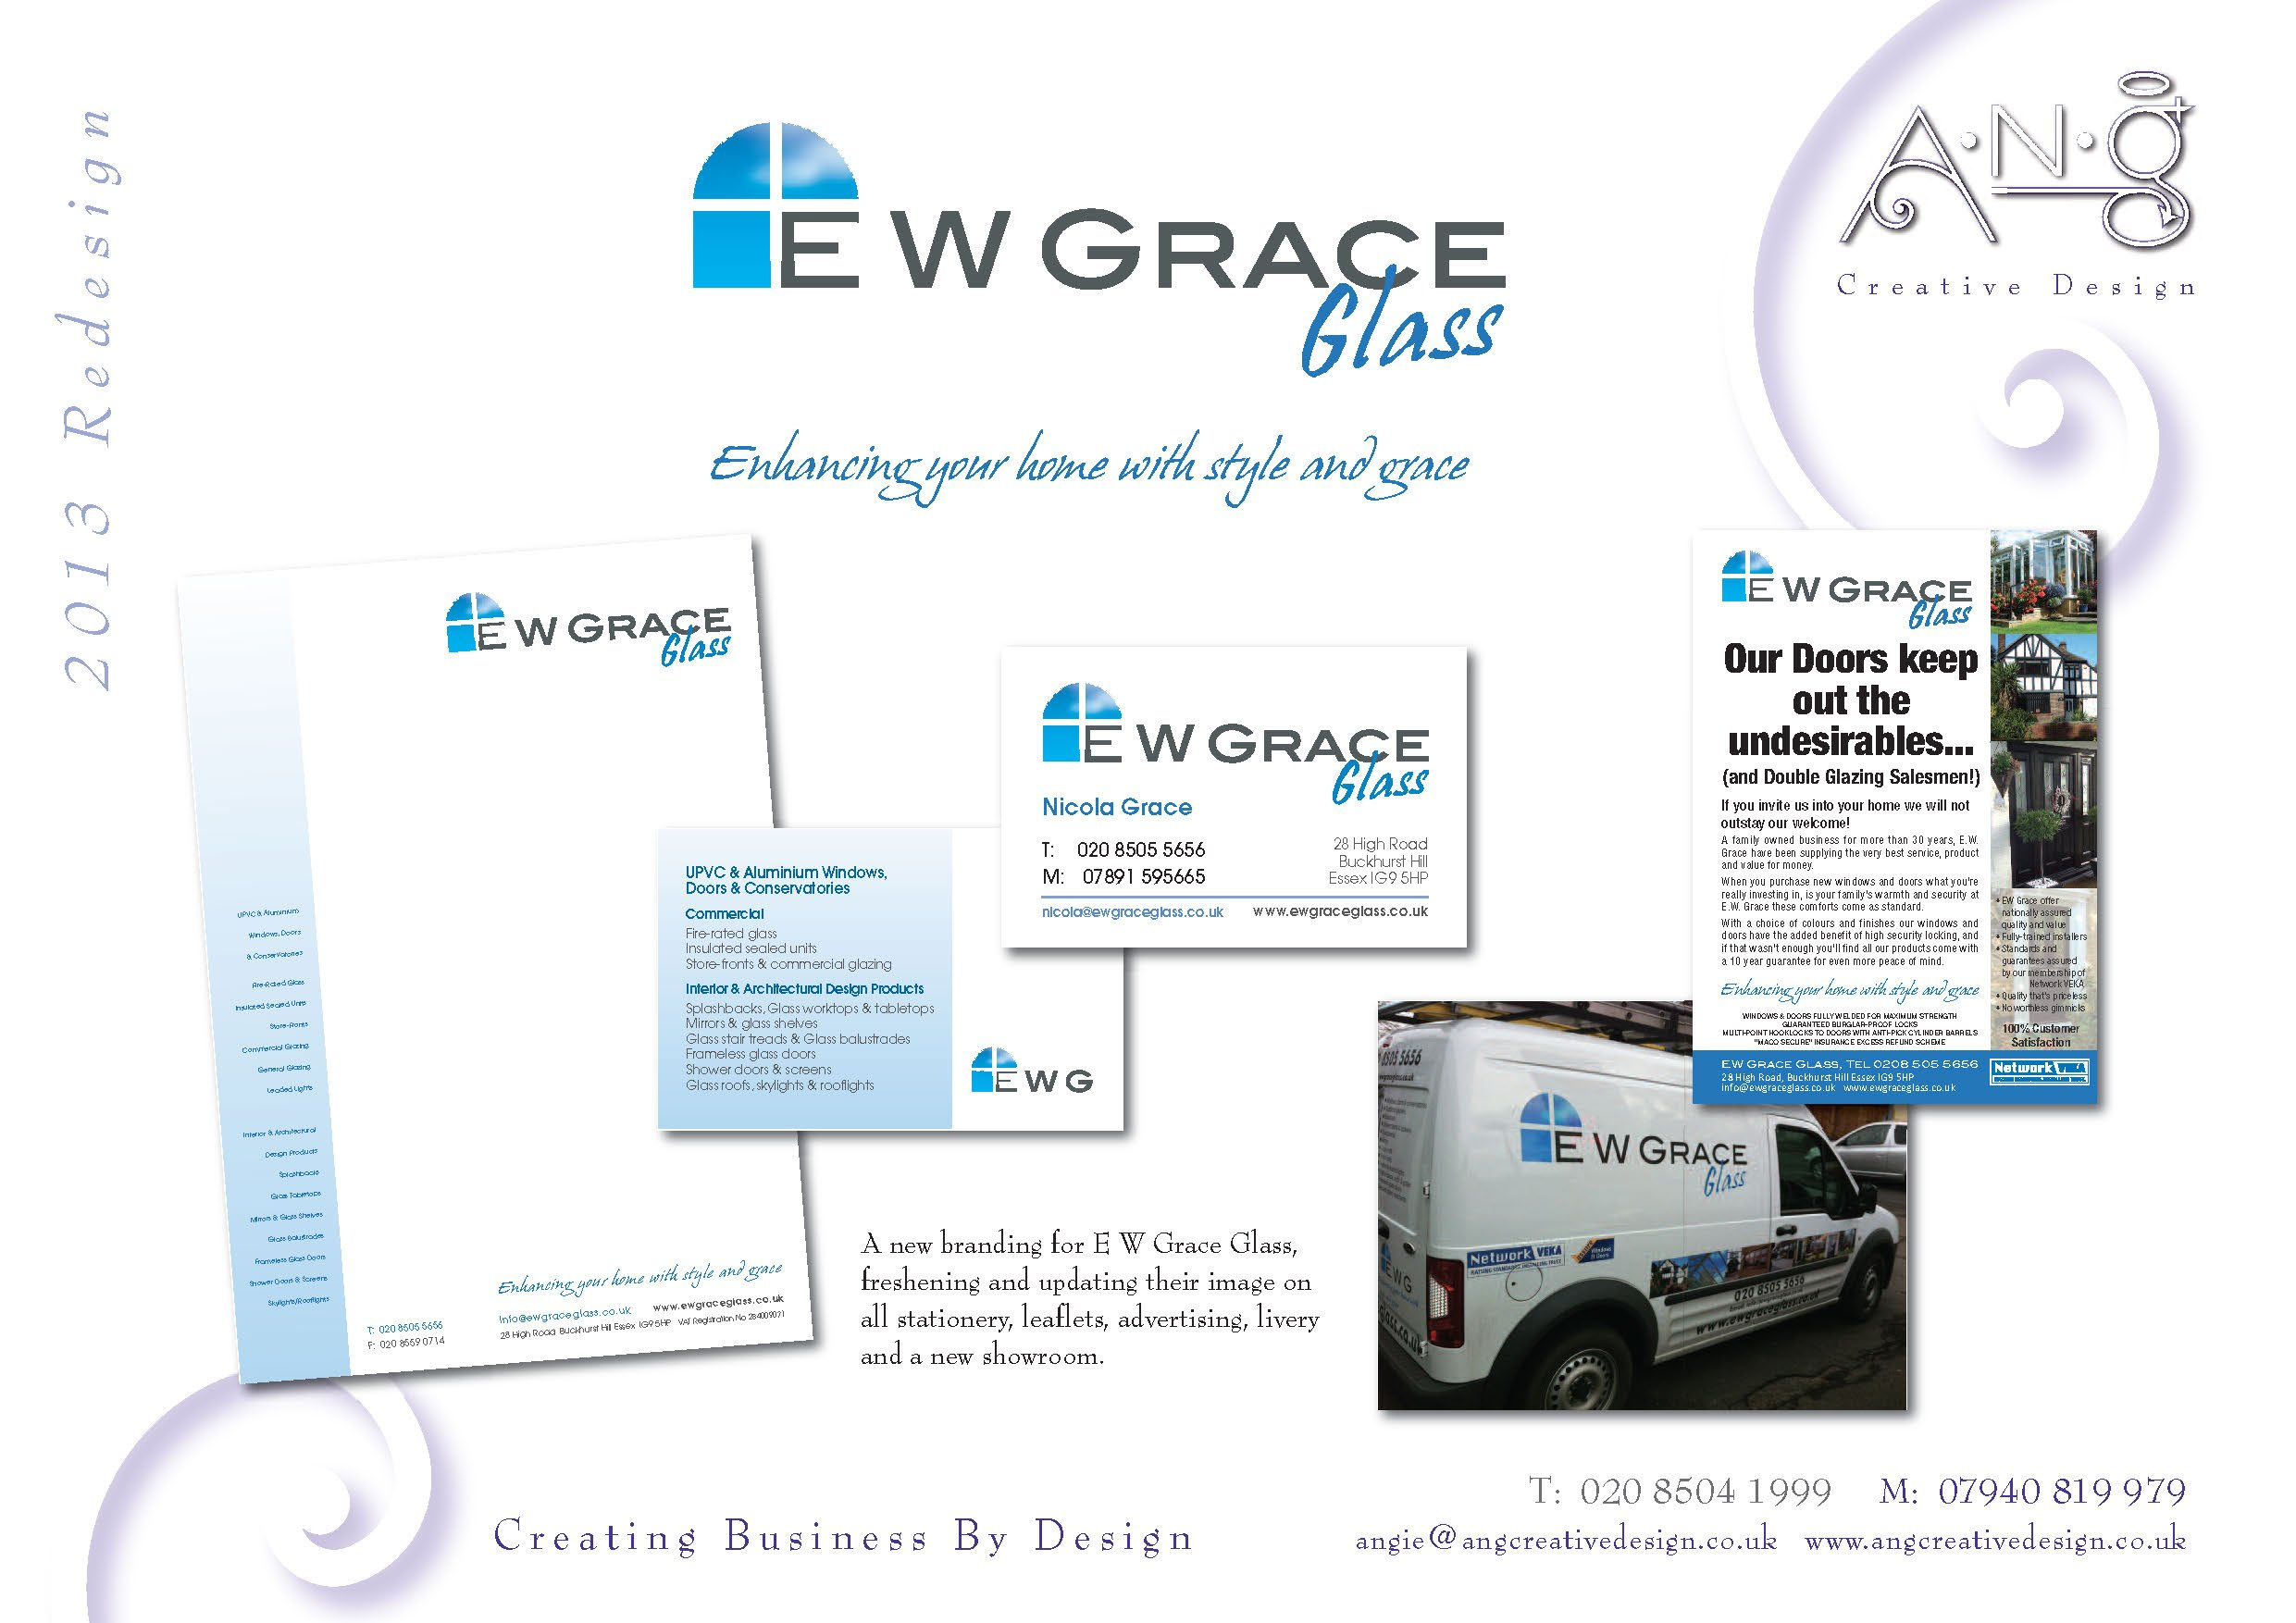 EW Grace Glass branding